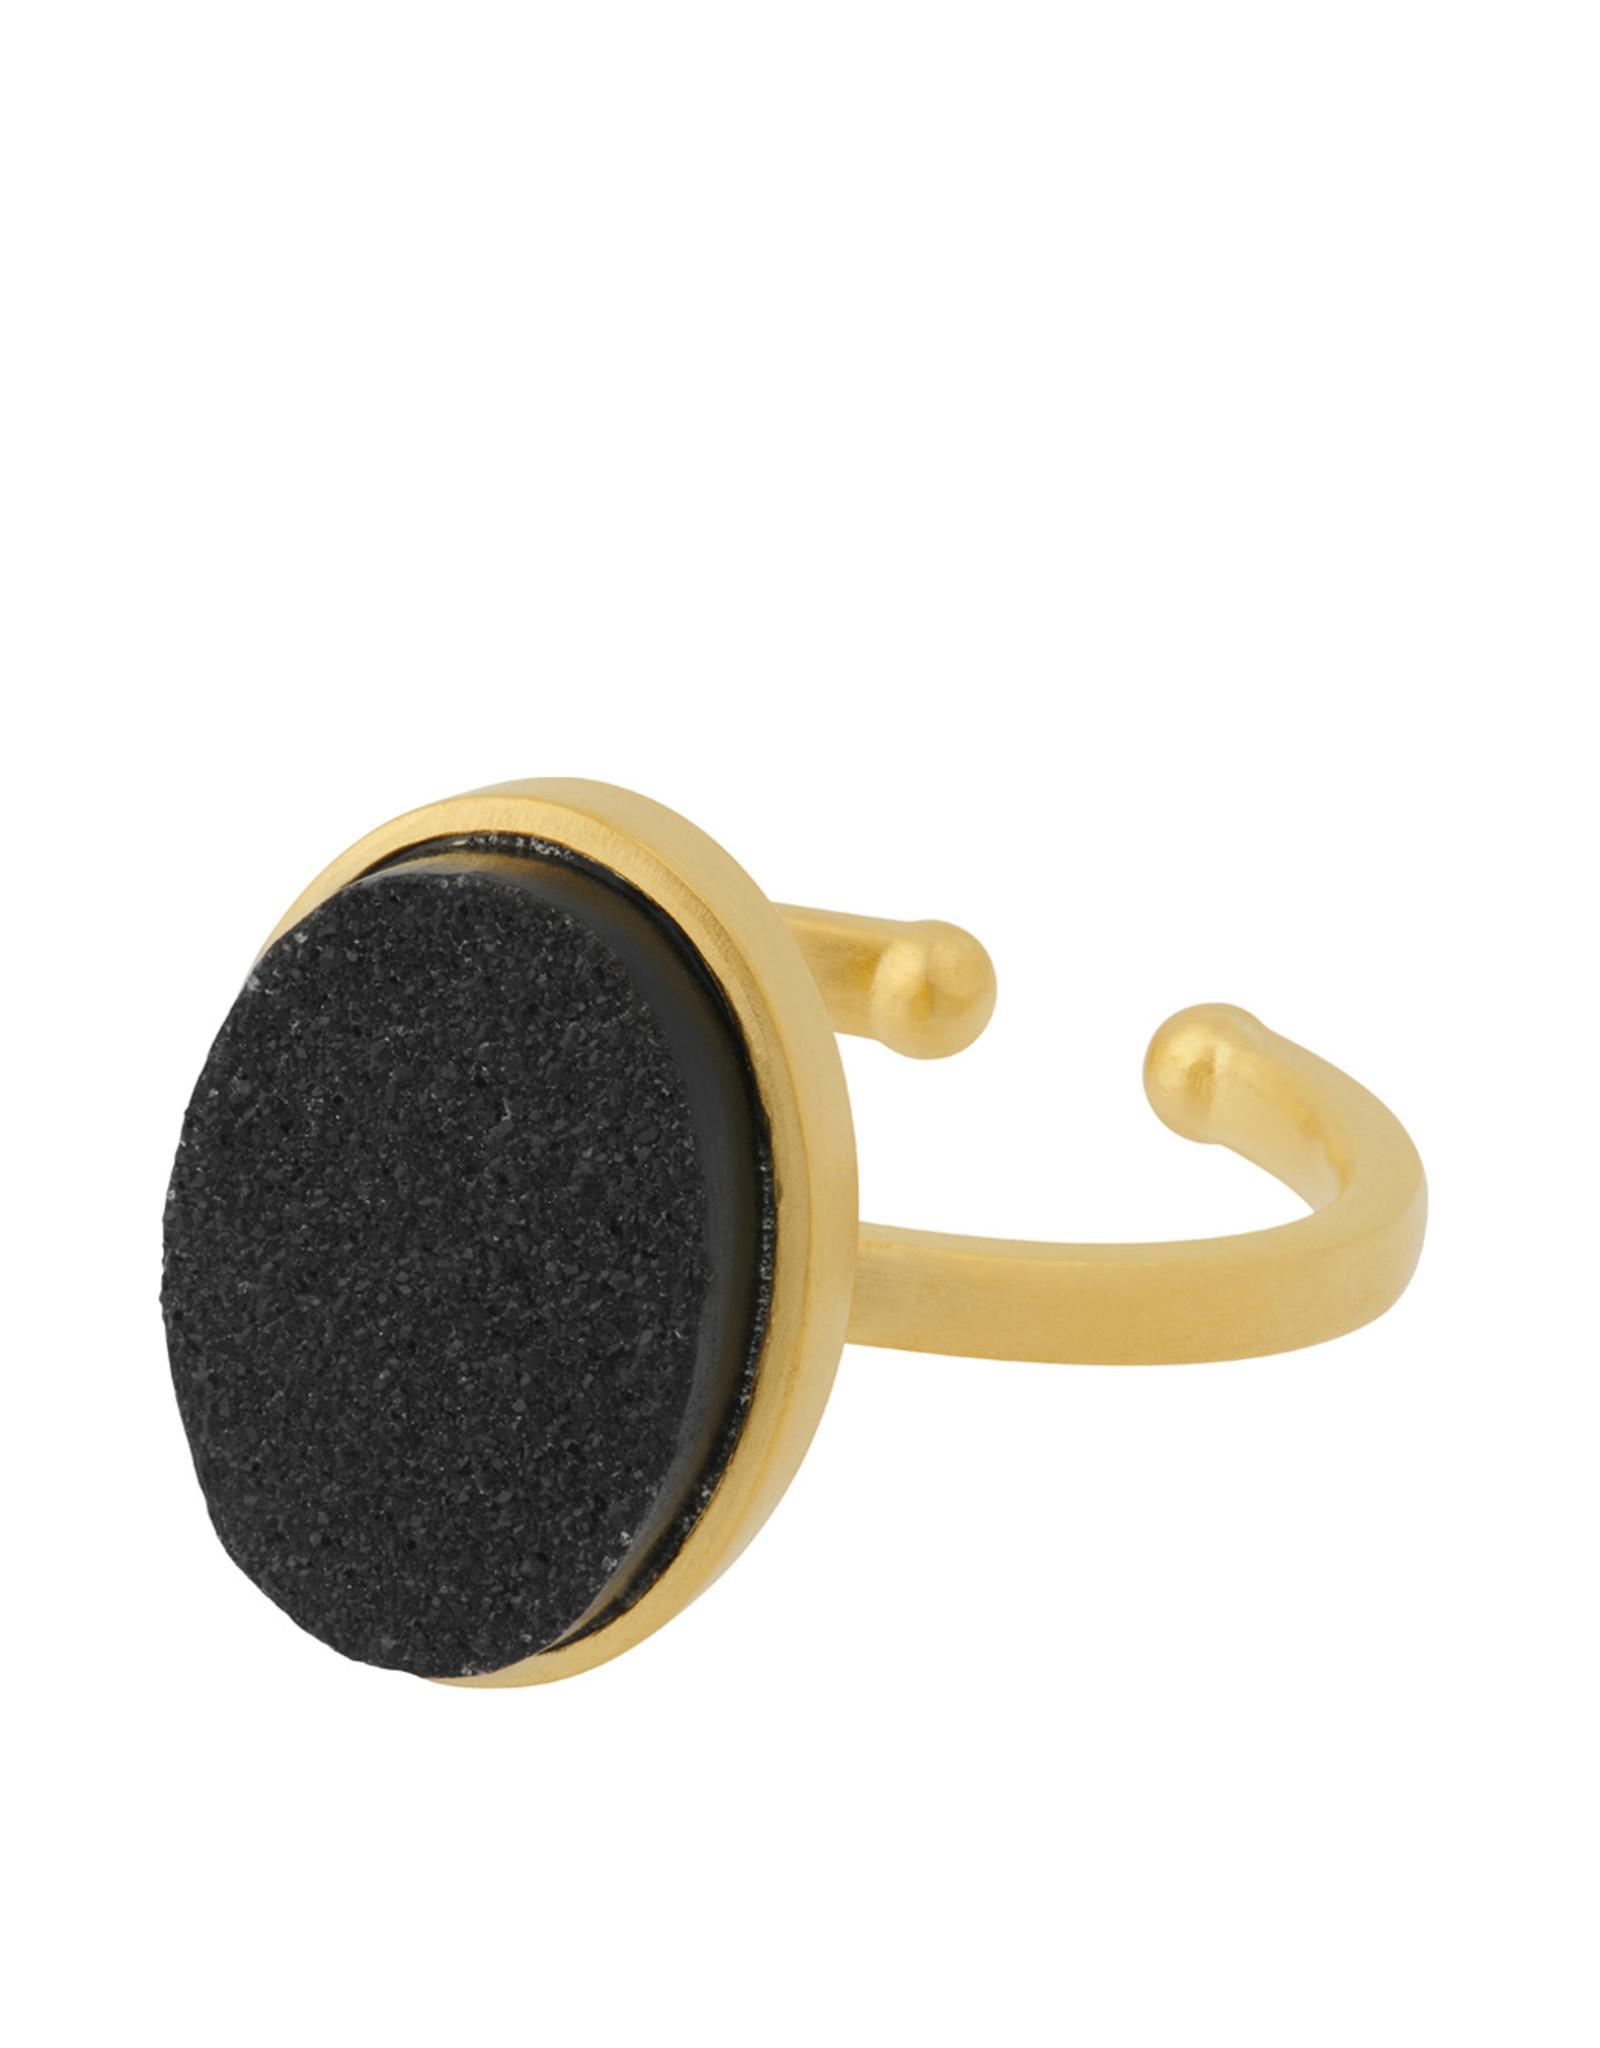 Pernille Corydon Ash Ring Black Druzy oval - 52